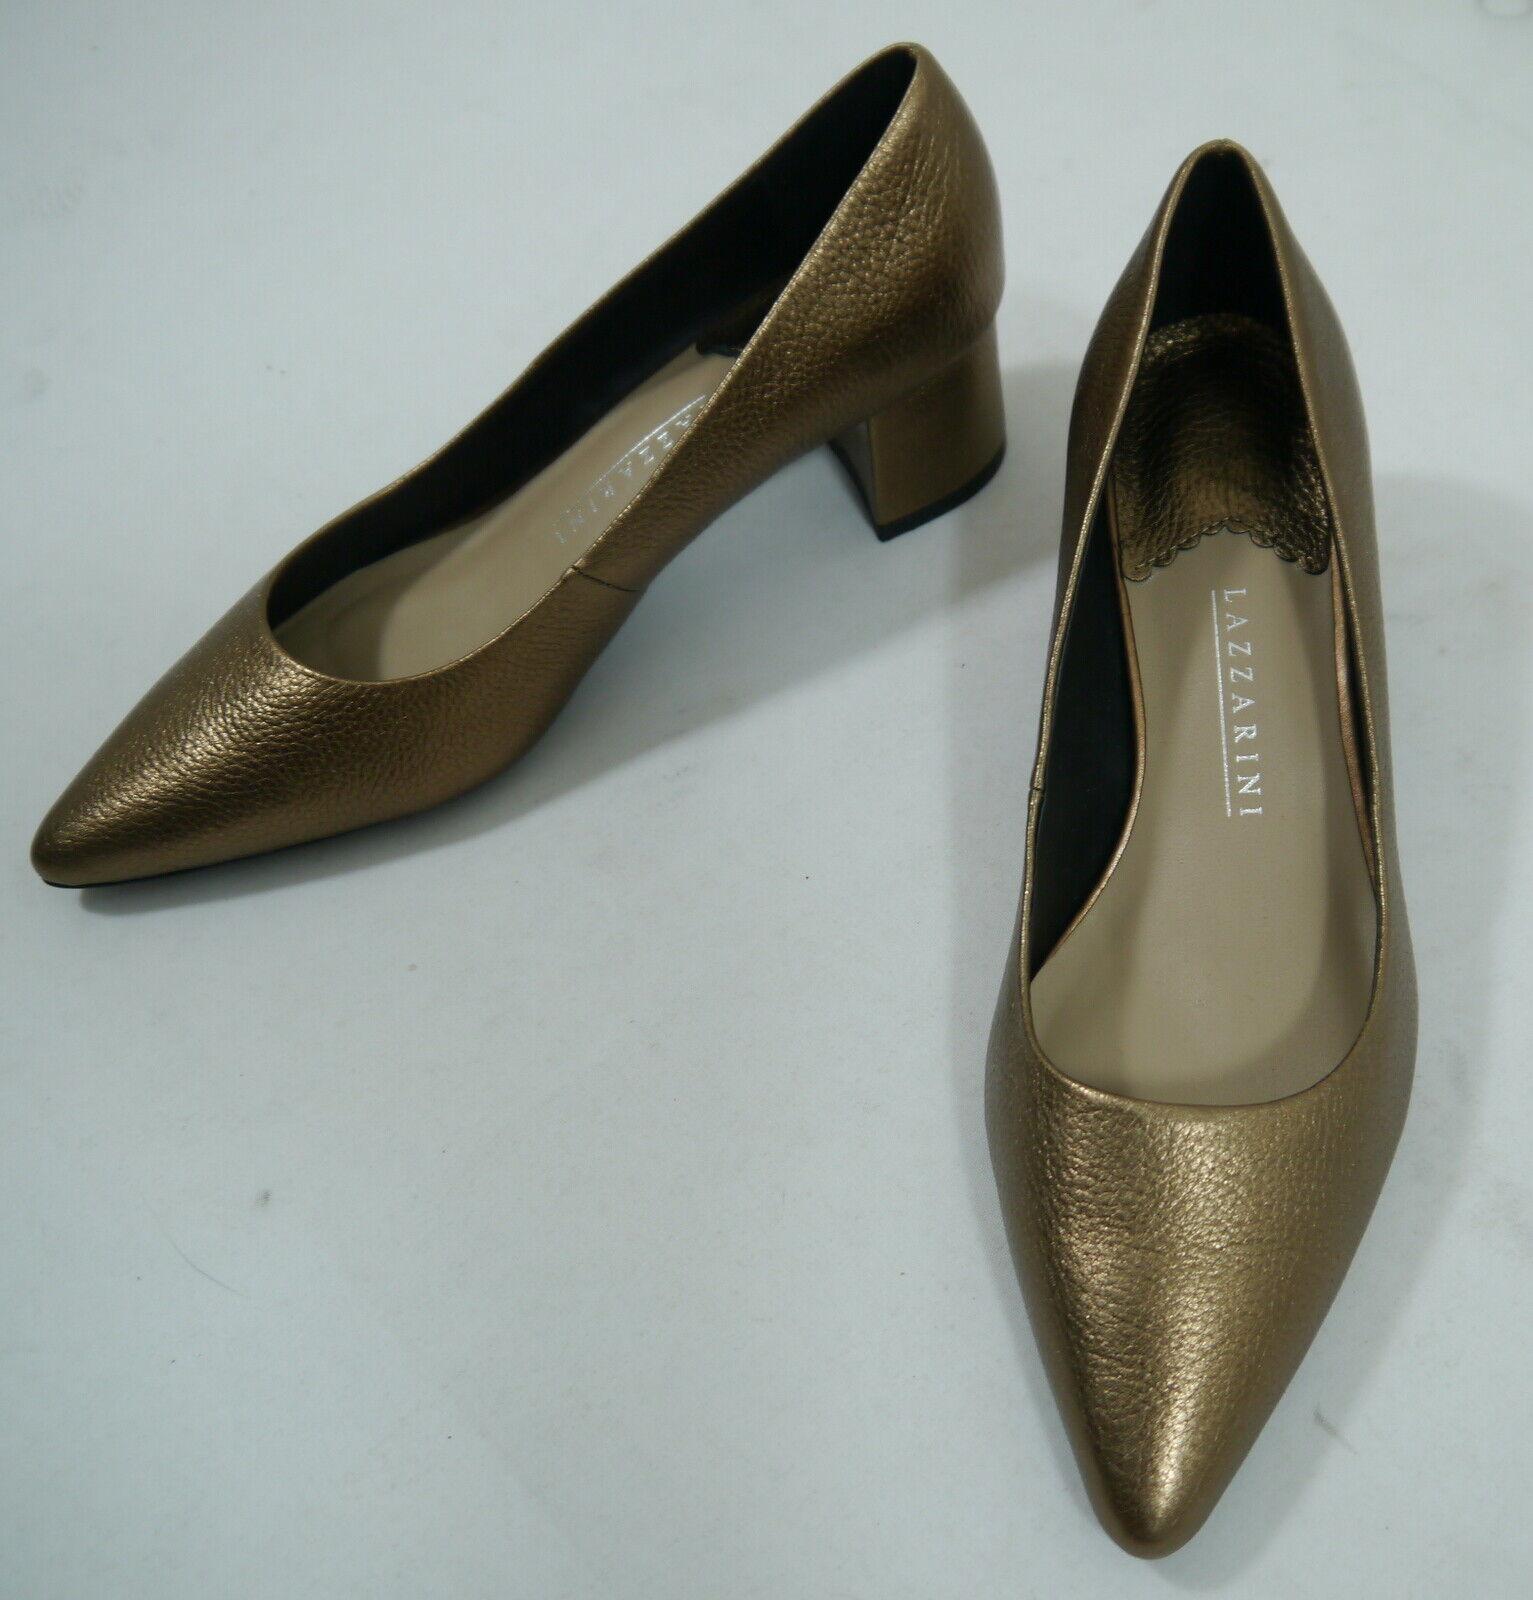 DamenLeder Pumps LAZZARINI Gold Gr.39 elegant Tanzschuhe NEU